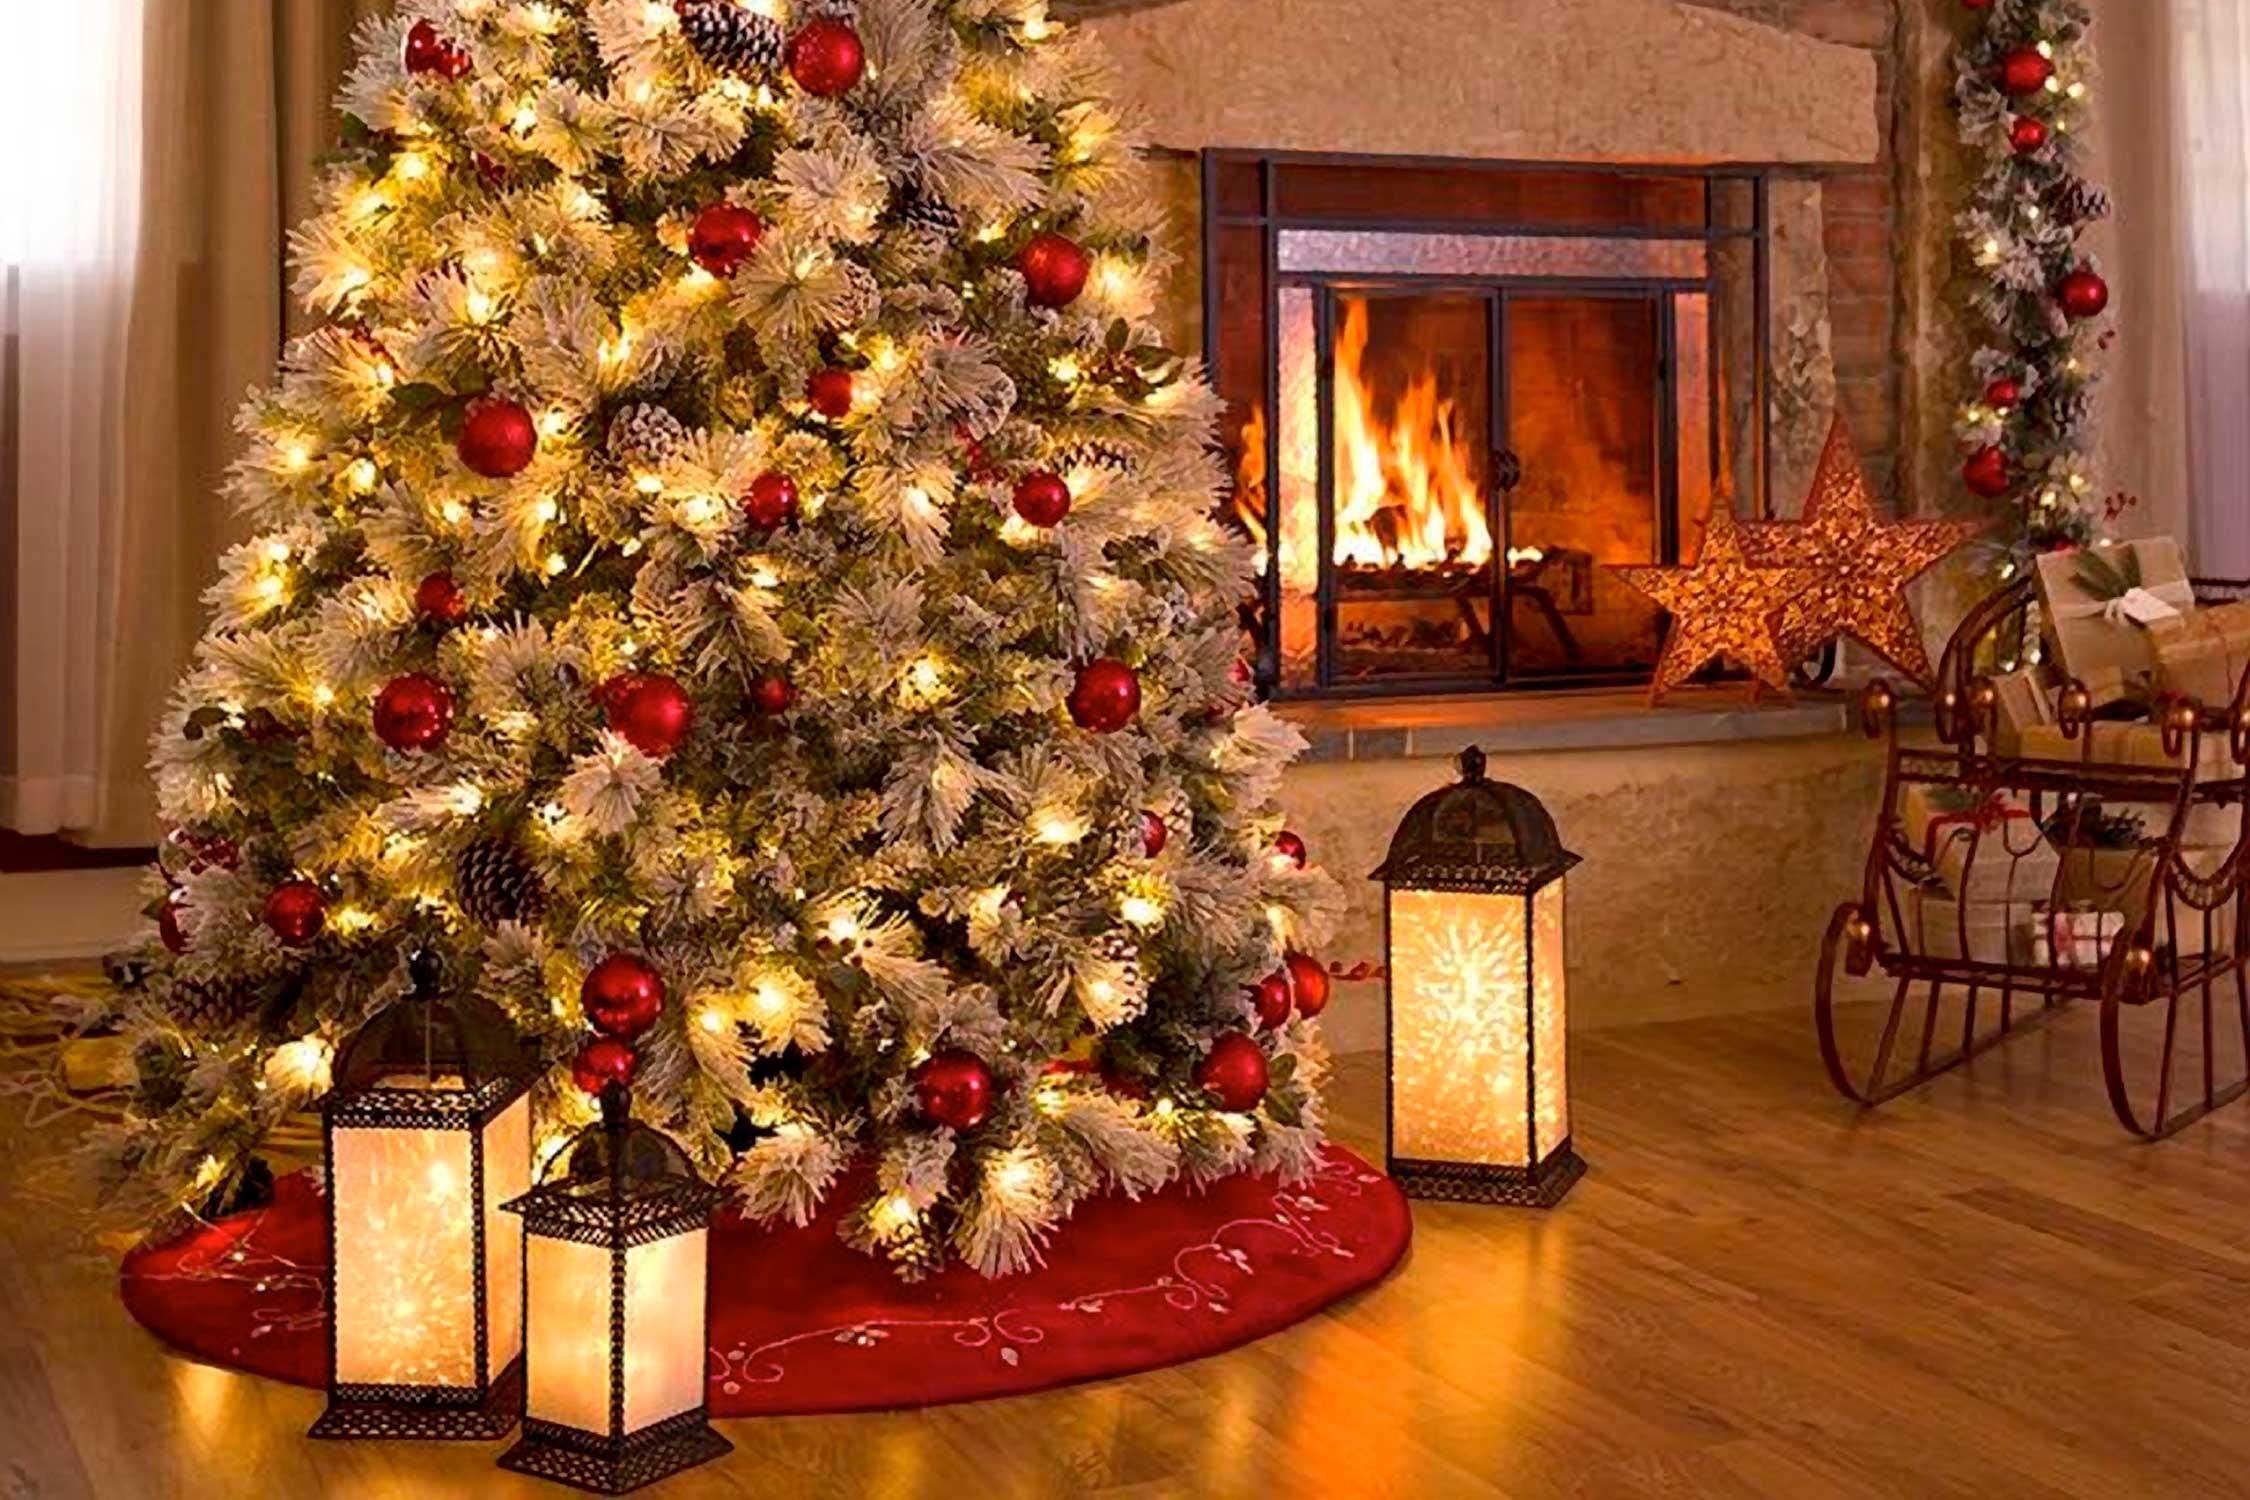 Best Christmas Trees in San Diego